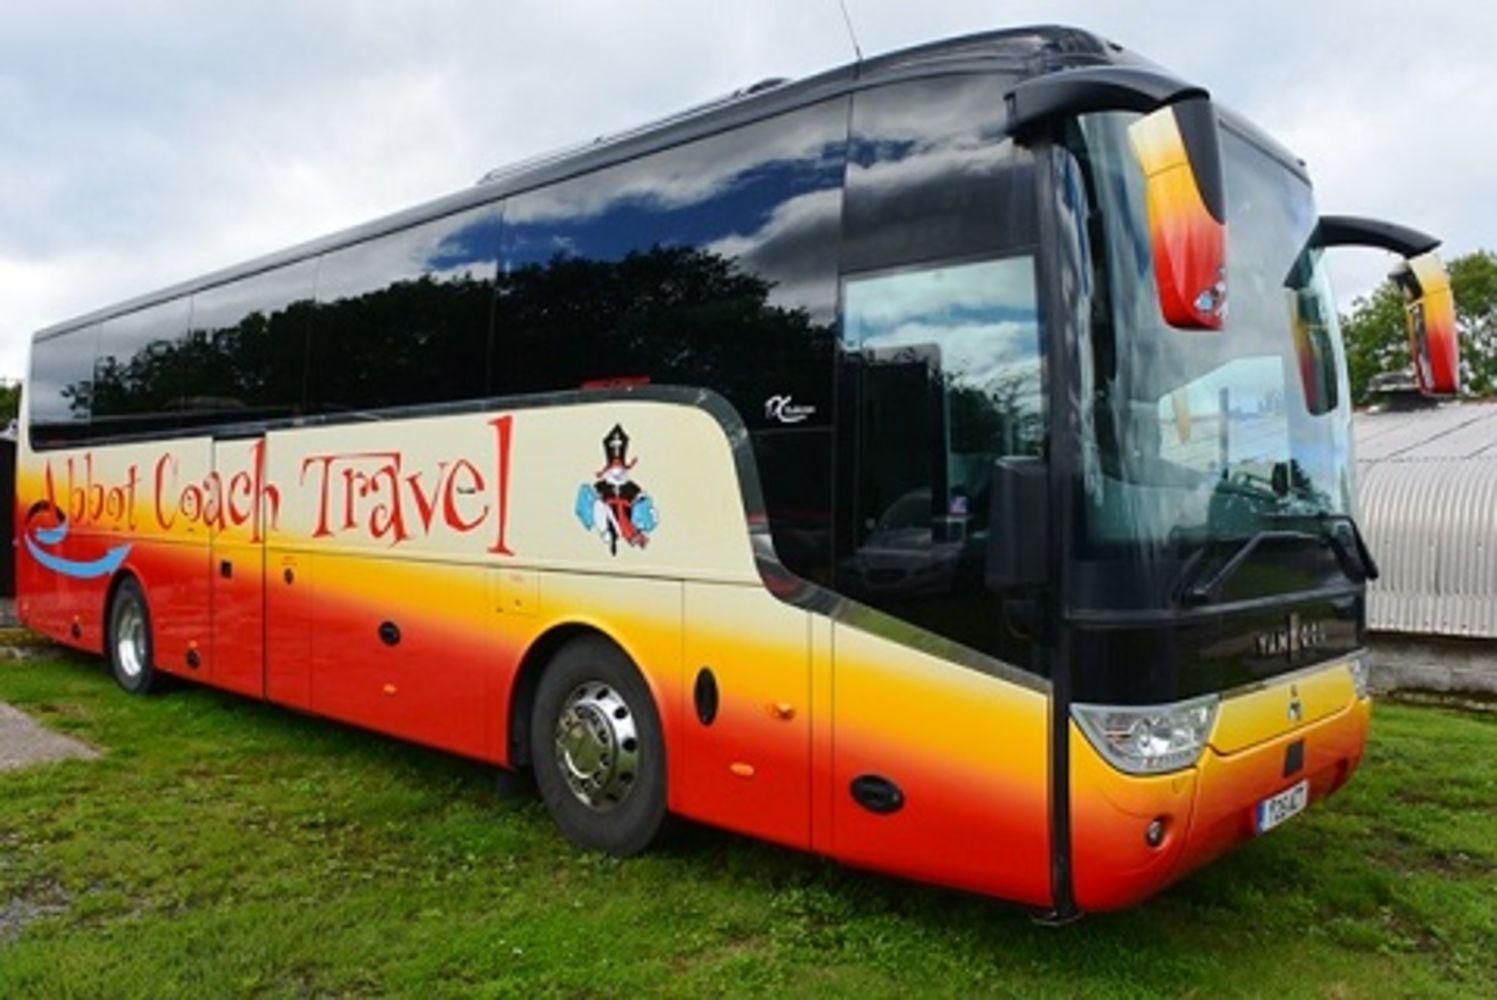 Abbot Coach Travel Ltd & Others